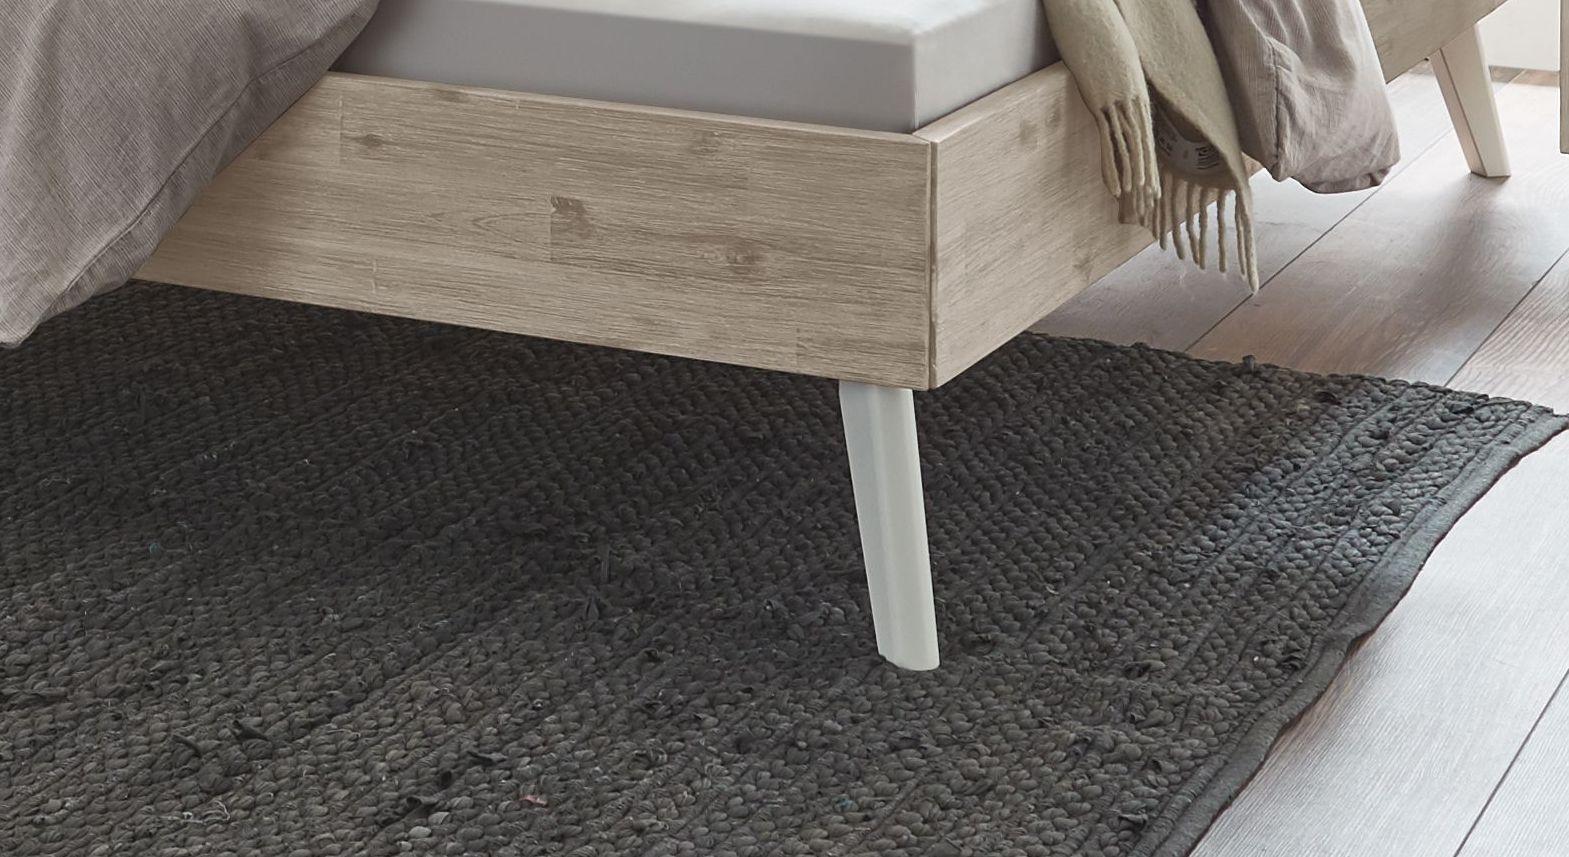 Bett Ranua mit weißen Massivholz-Füßen